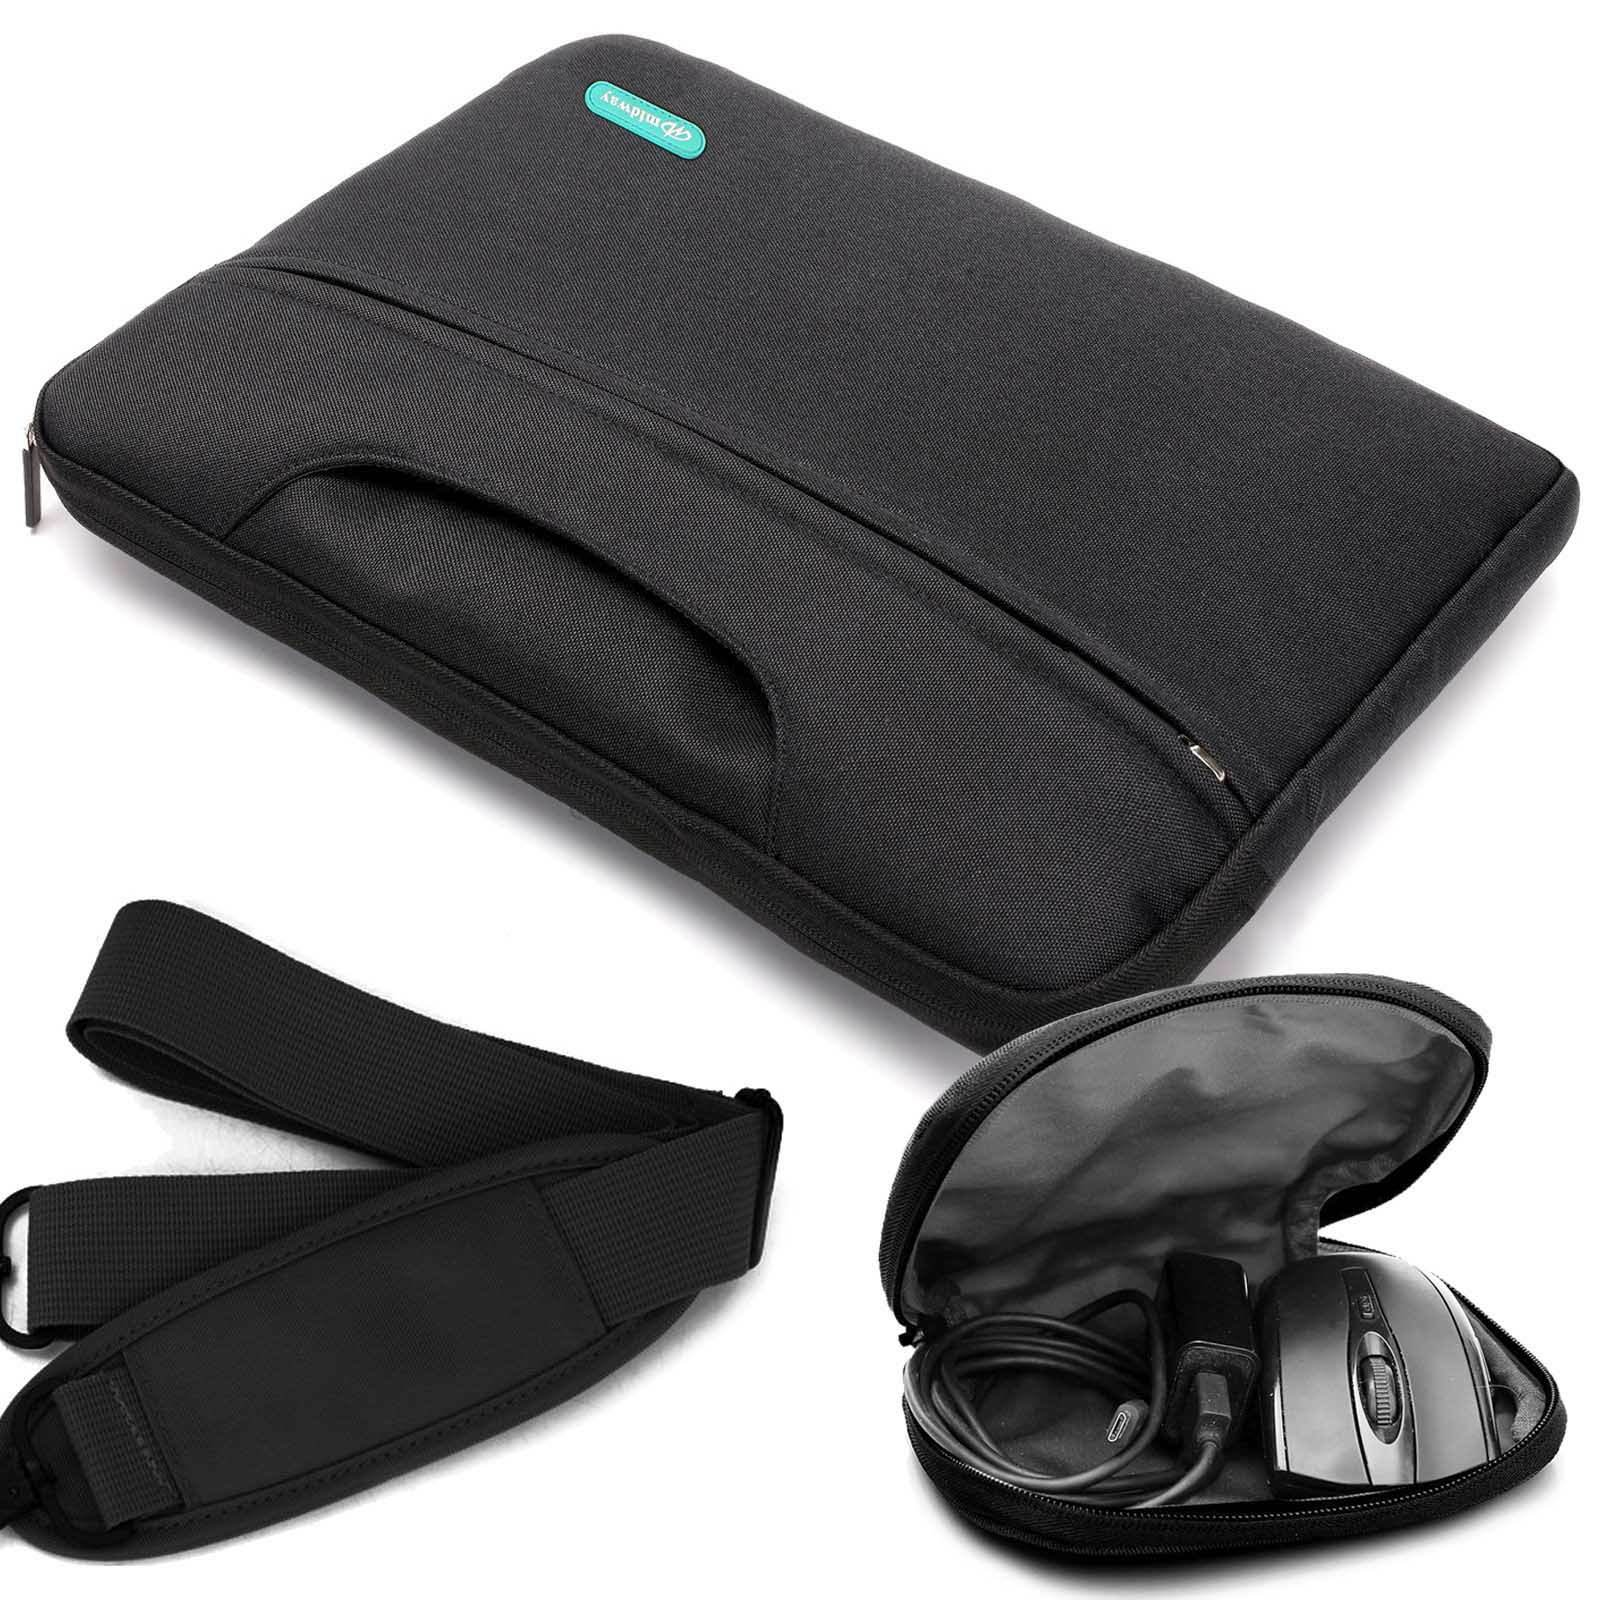 Laptop Sleeve Case Cover Bag with Shoulder Strap for 15-15.6